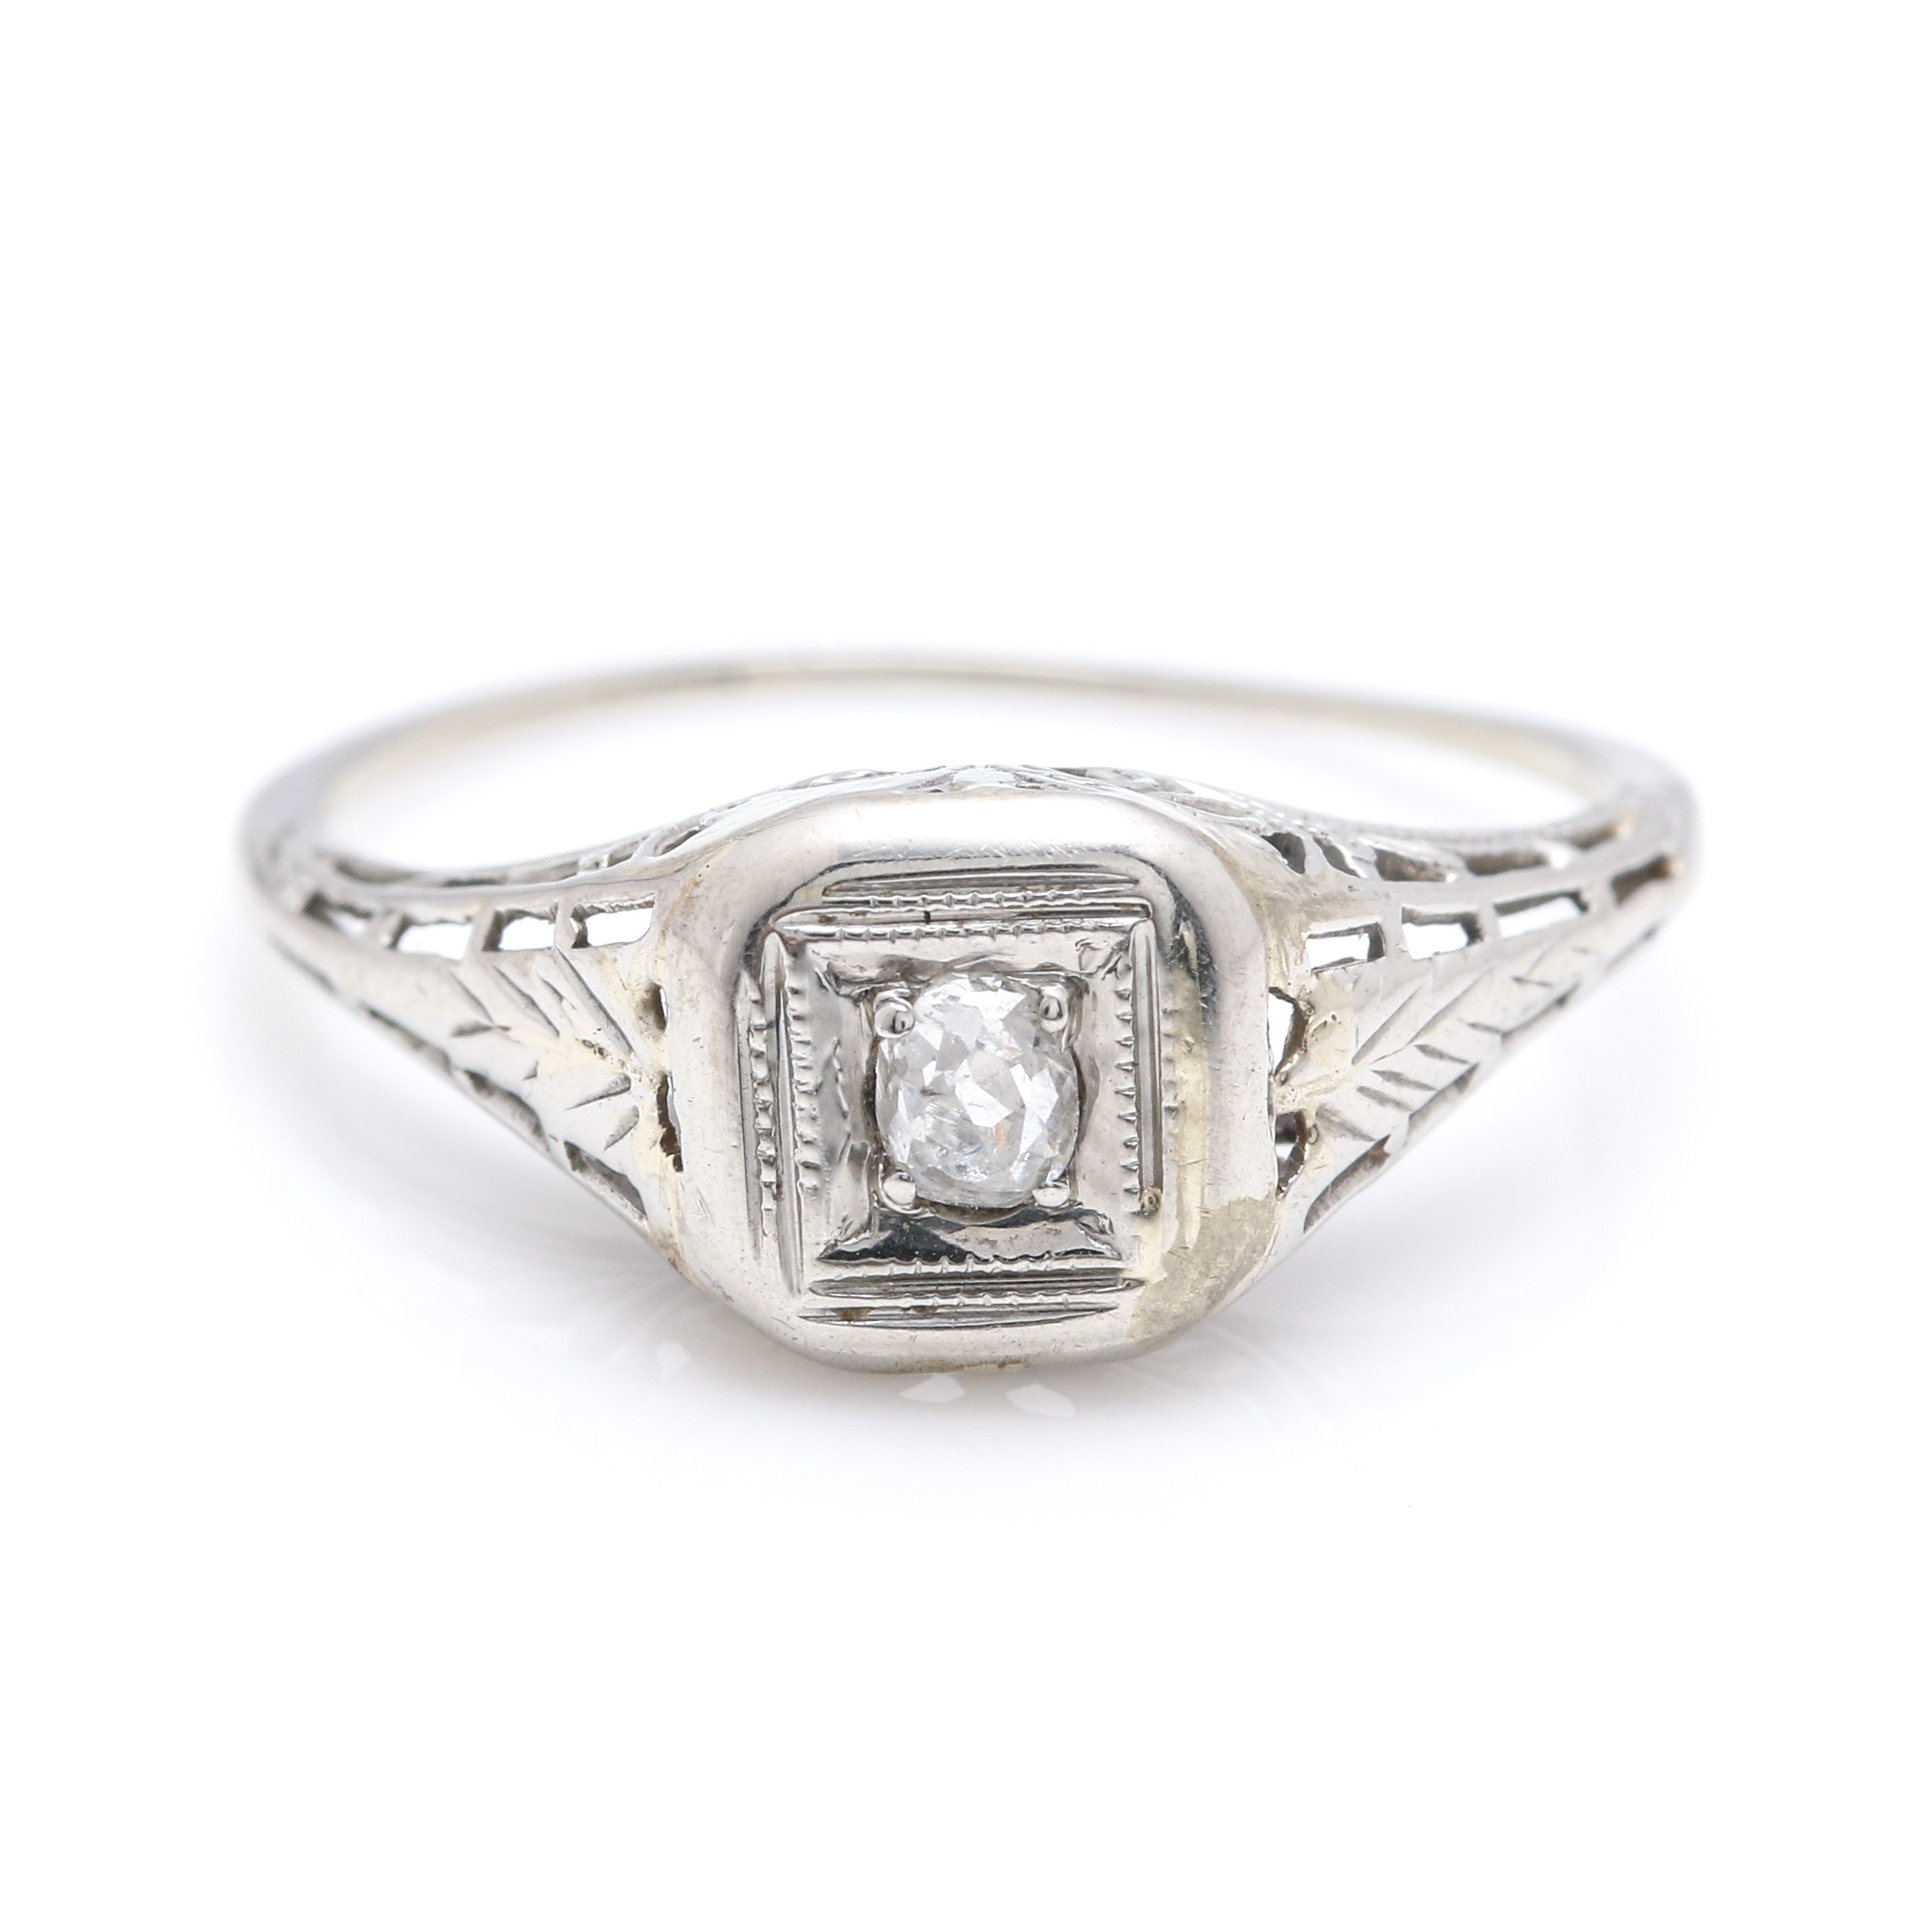 Late Edwardian 18K White Gold Diamond Ring